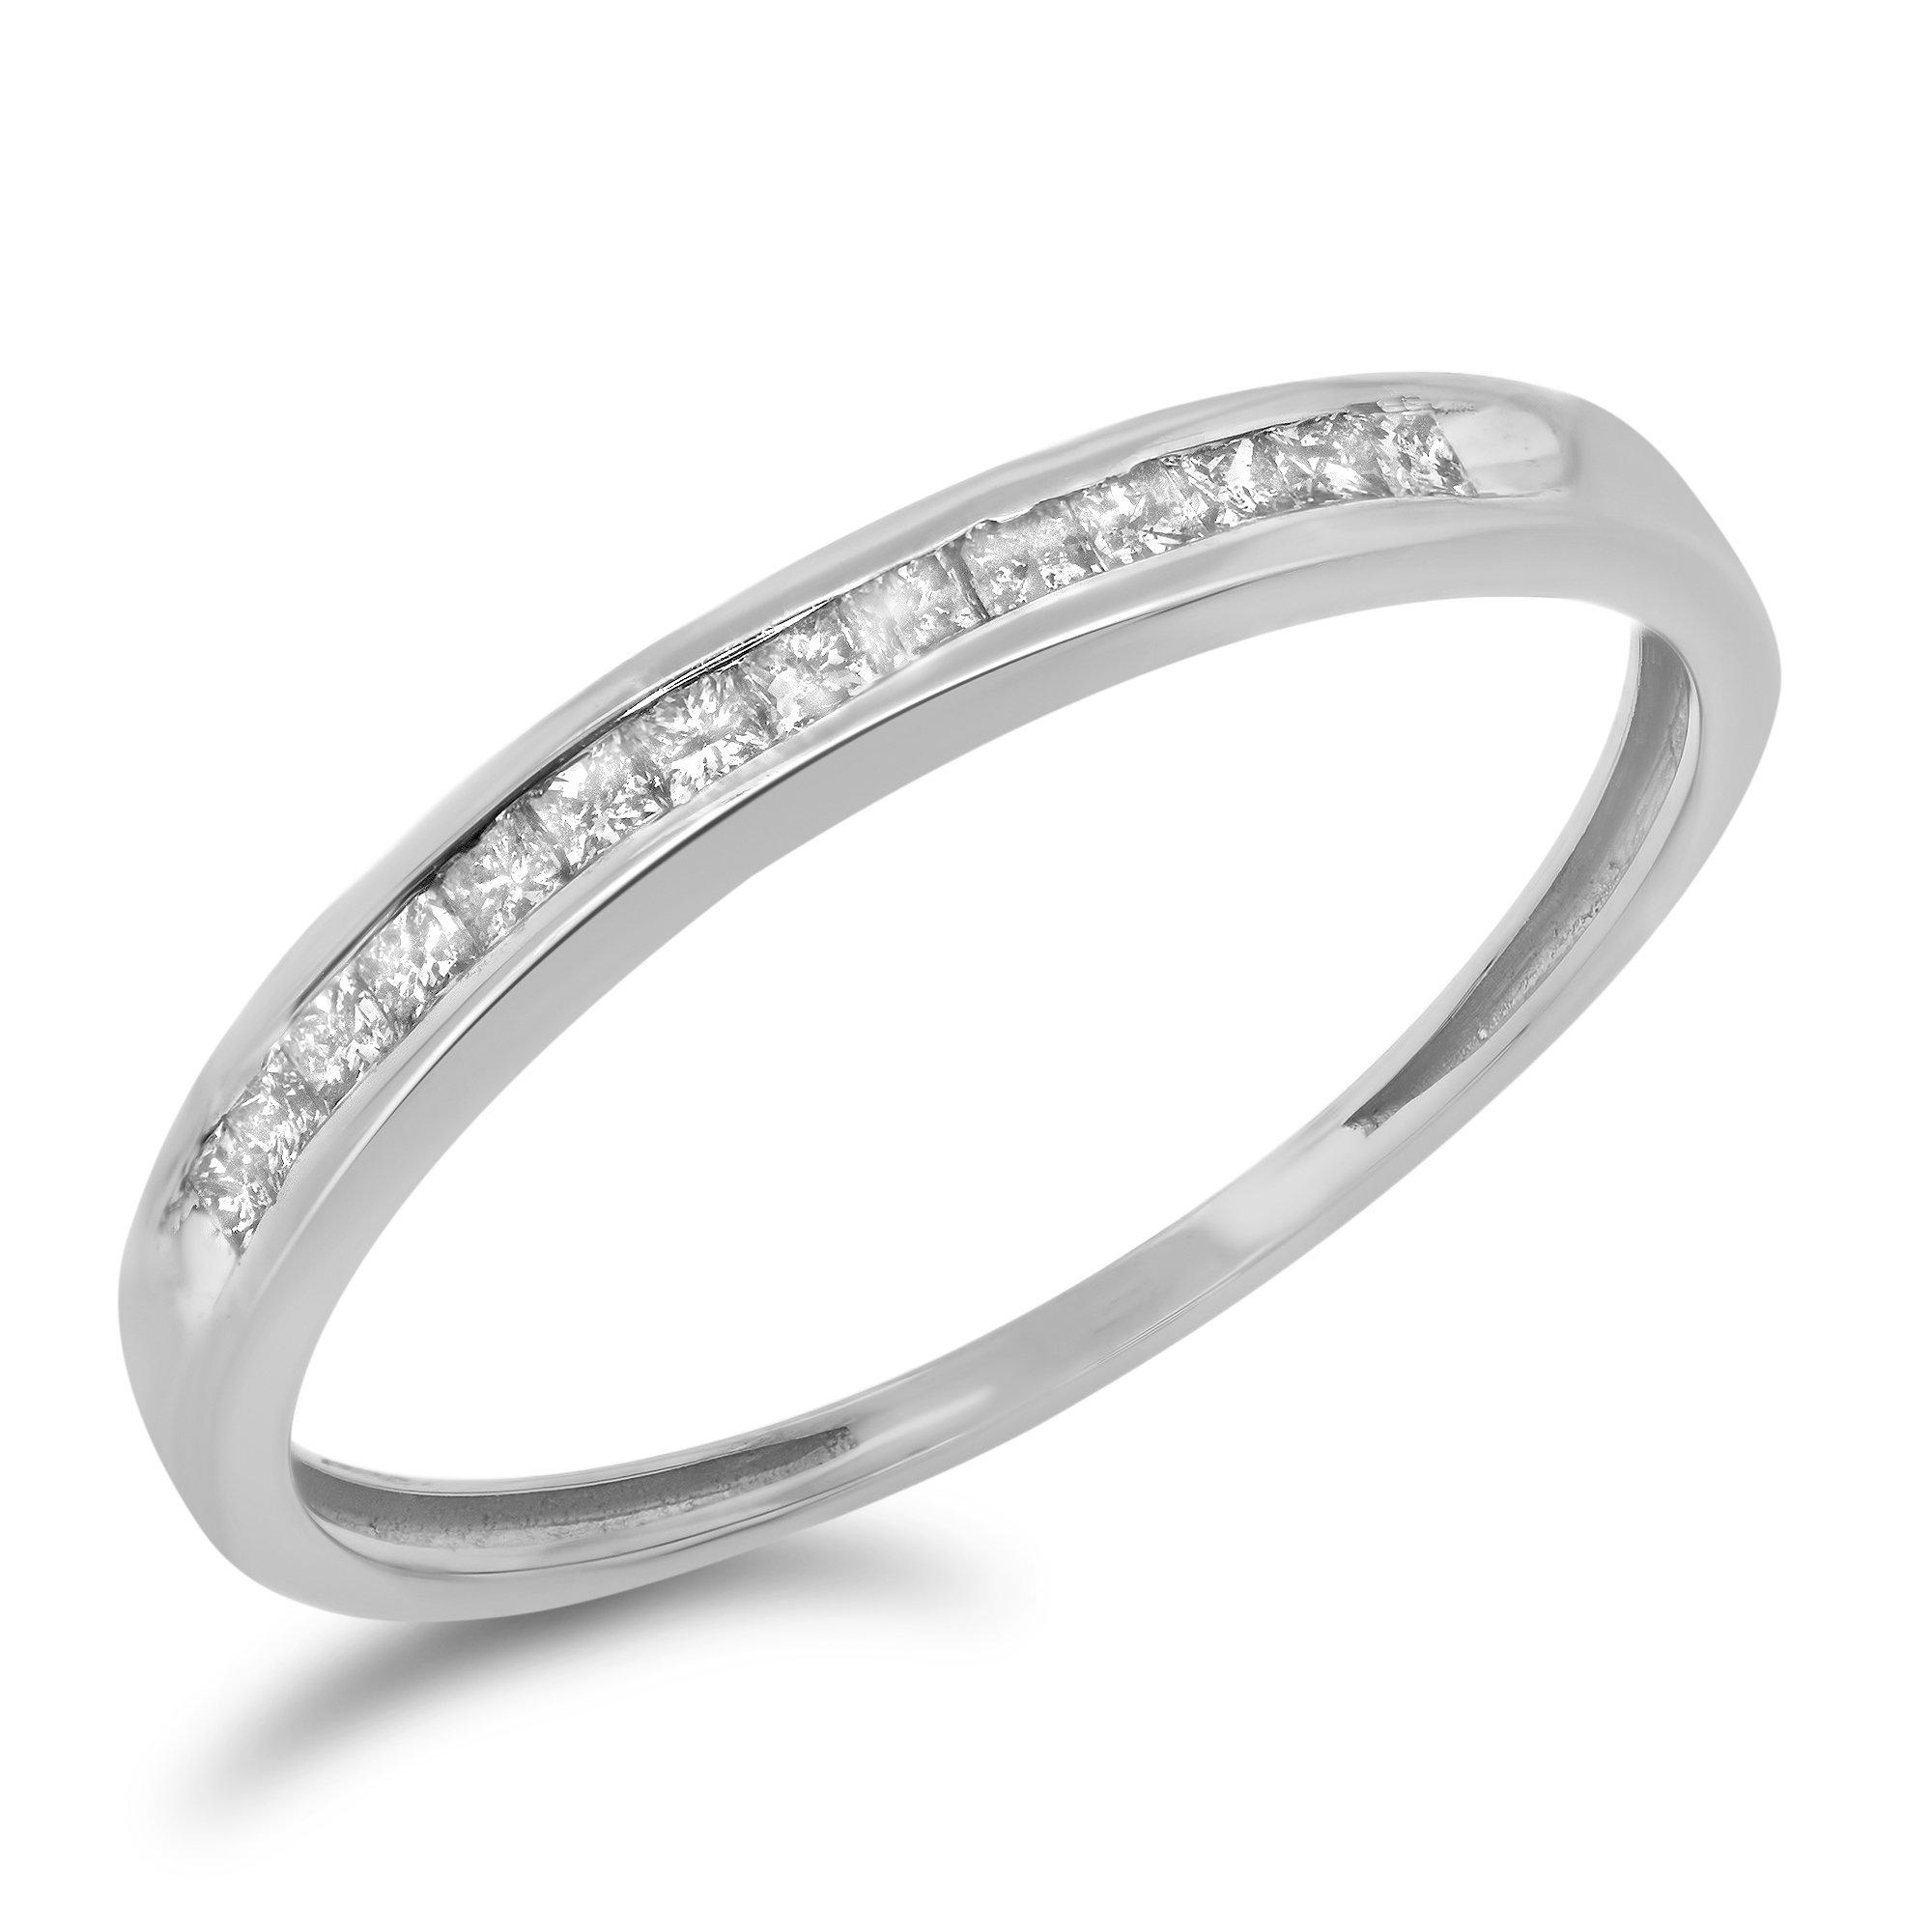 0.18 Carat (ctw) 10k Gold Princess Cut Diamond Ladies Wedding Band Channel Set Anniversary Ring 1/5 CT - White-gold, Size 8